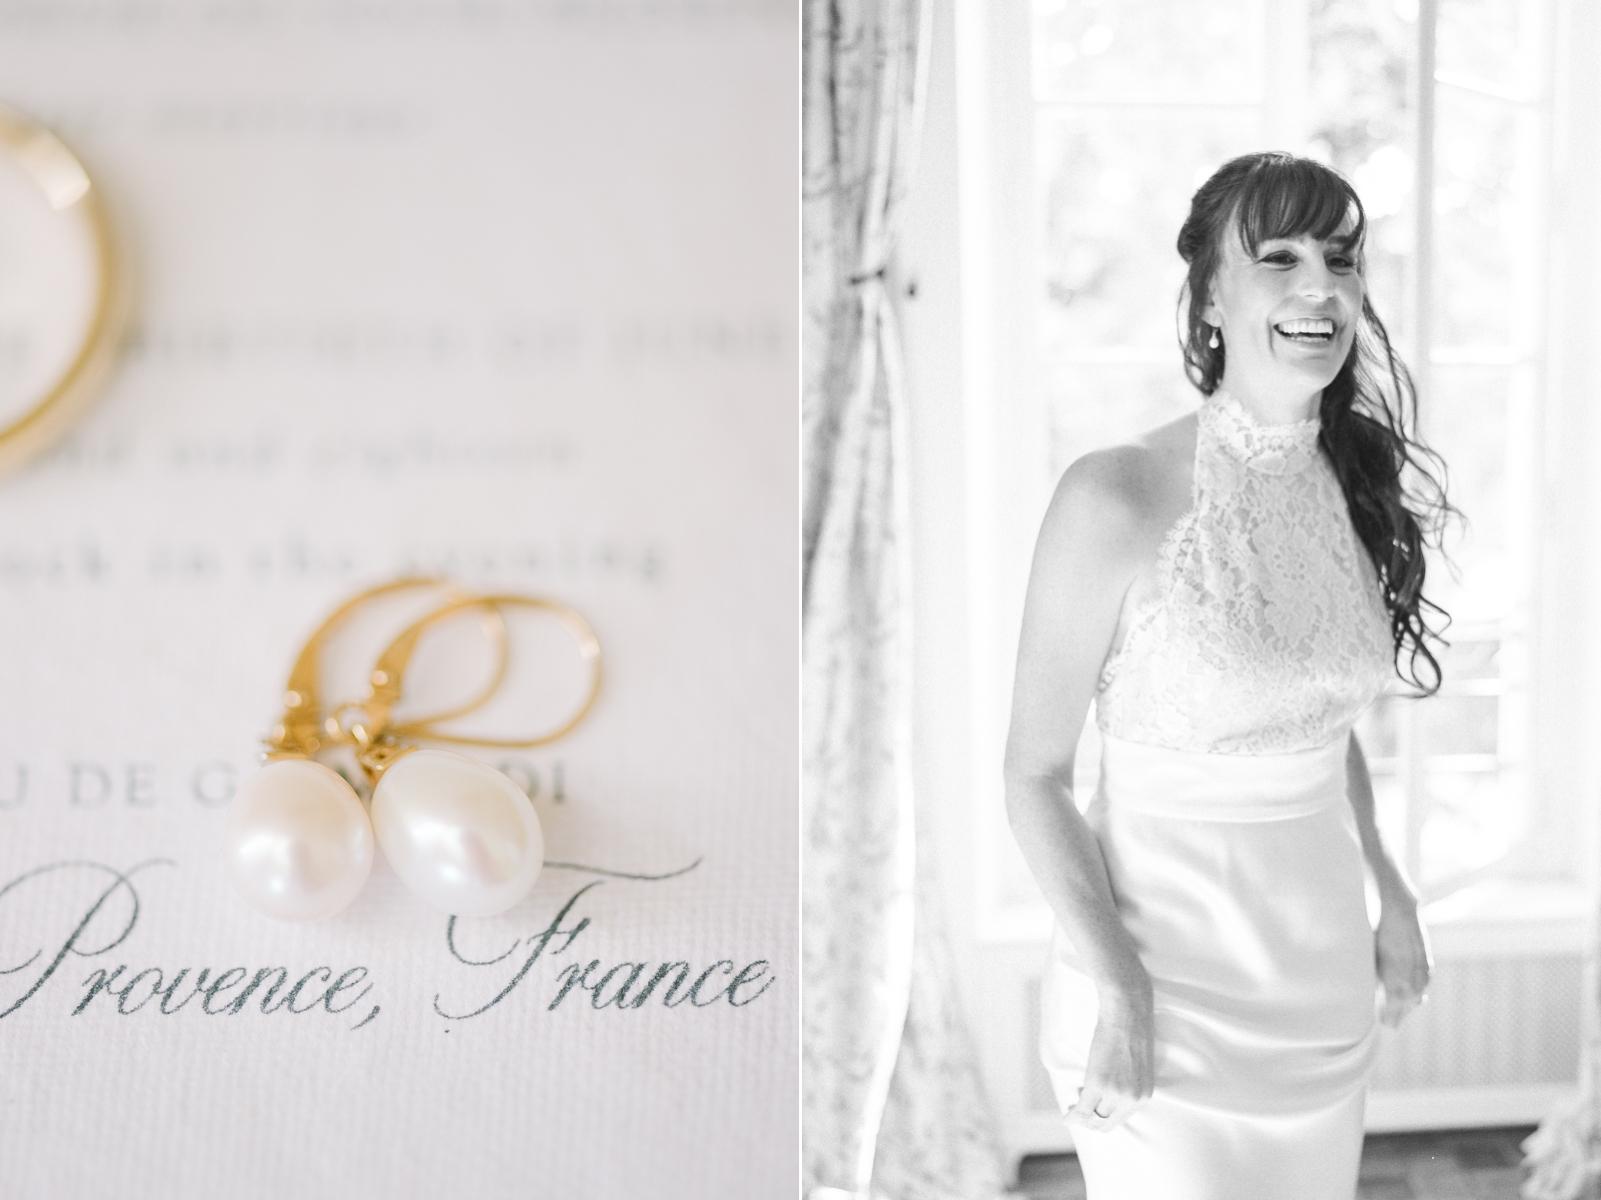 Boheme-Moon-Photography-Wedding-in-Provence-France_012.jpg